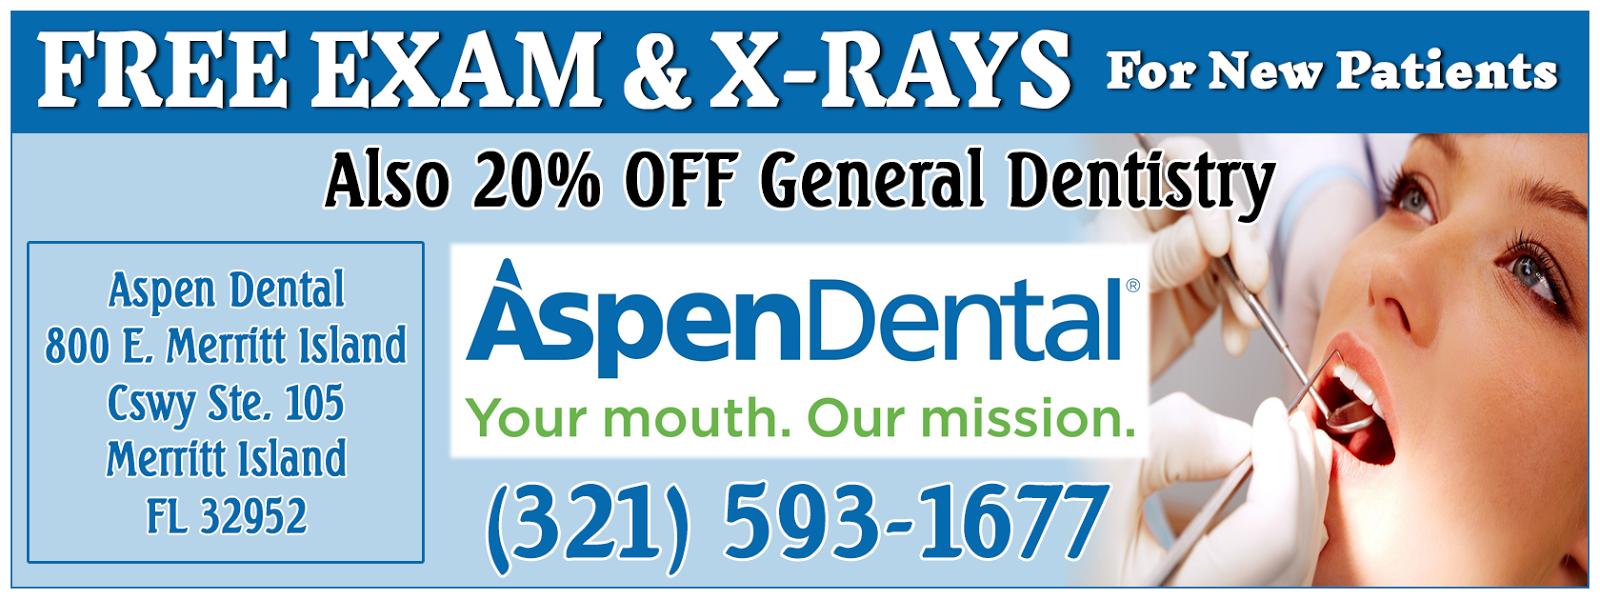 Aspen Dental In Merritt Island Fl